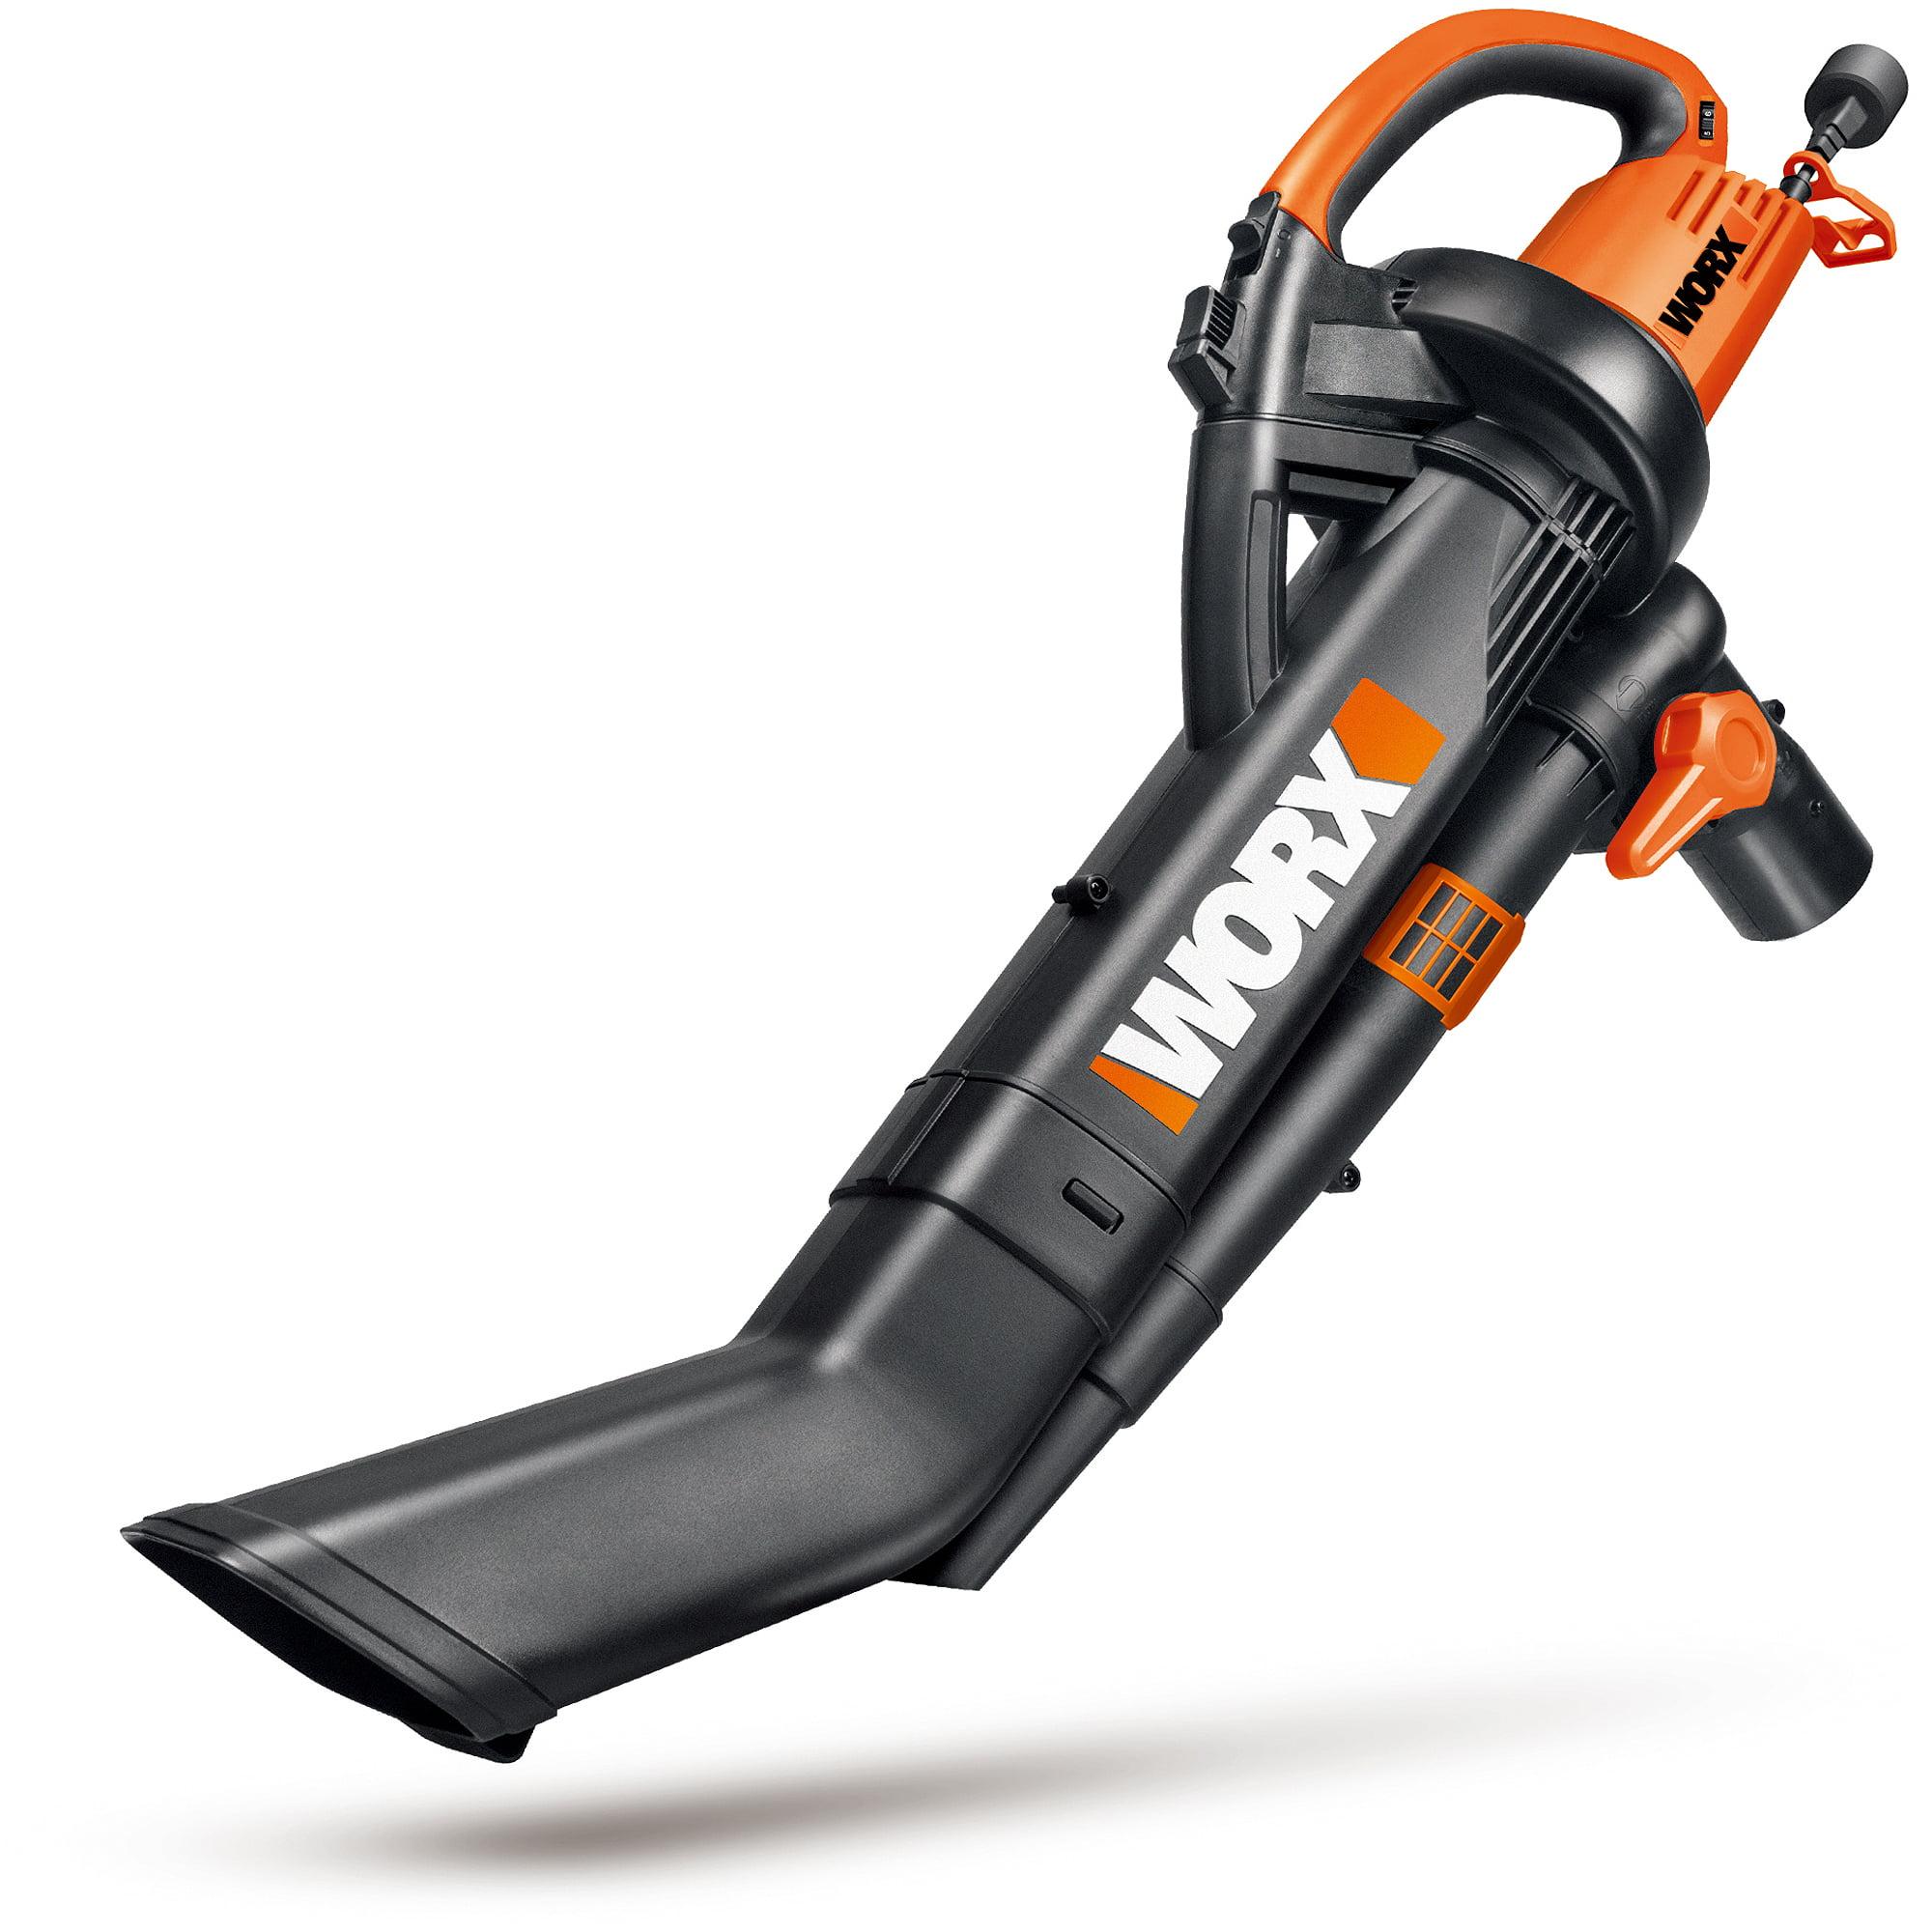 WORX WG509 TriVac, 12Amp Blower/Mulcher/Vacuum